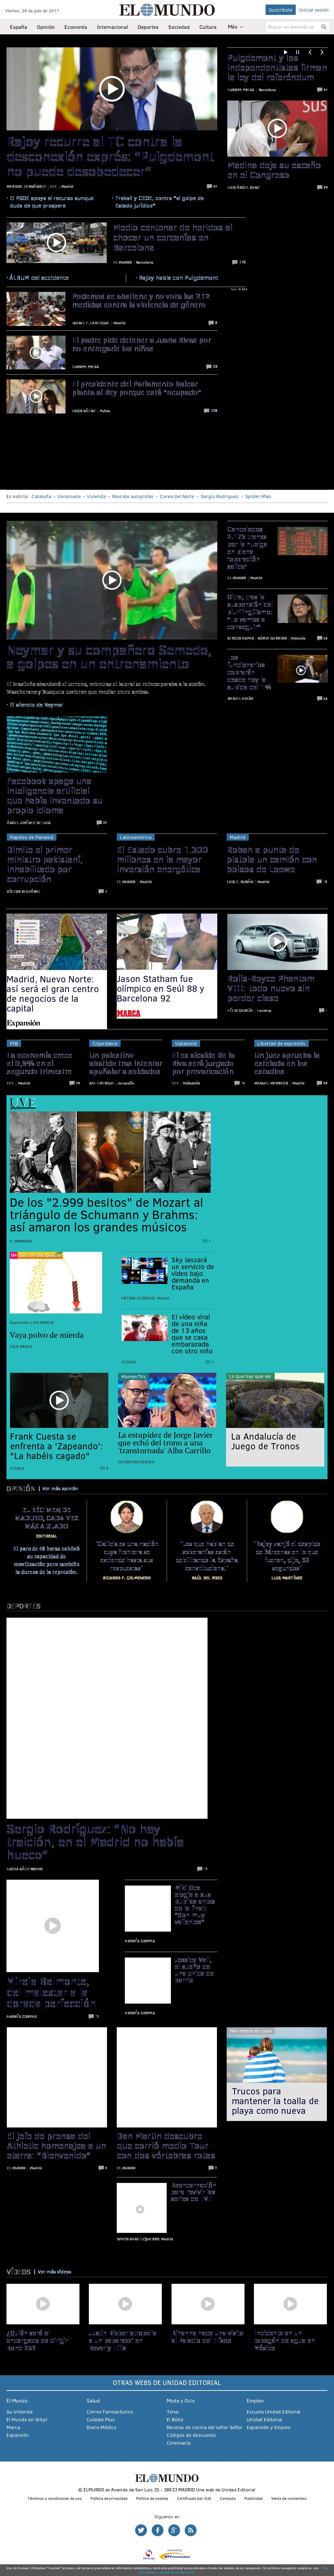 El Mundo at Friday July 28, 2017, 2:12 p.m. UTC